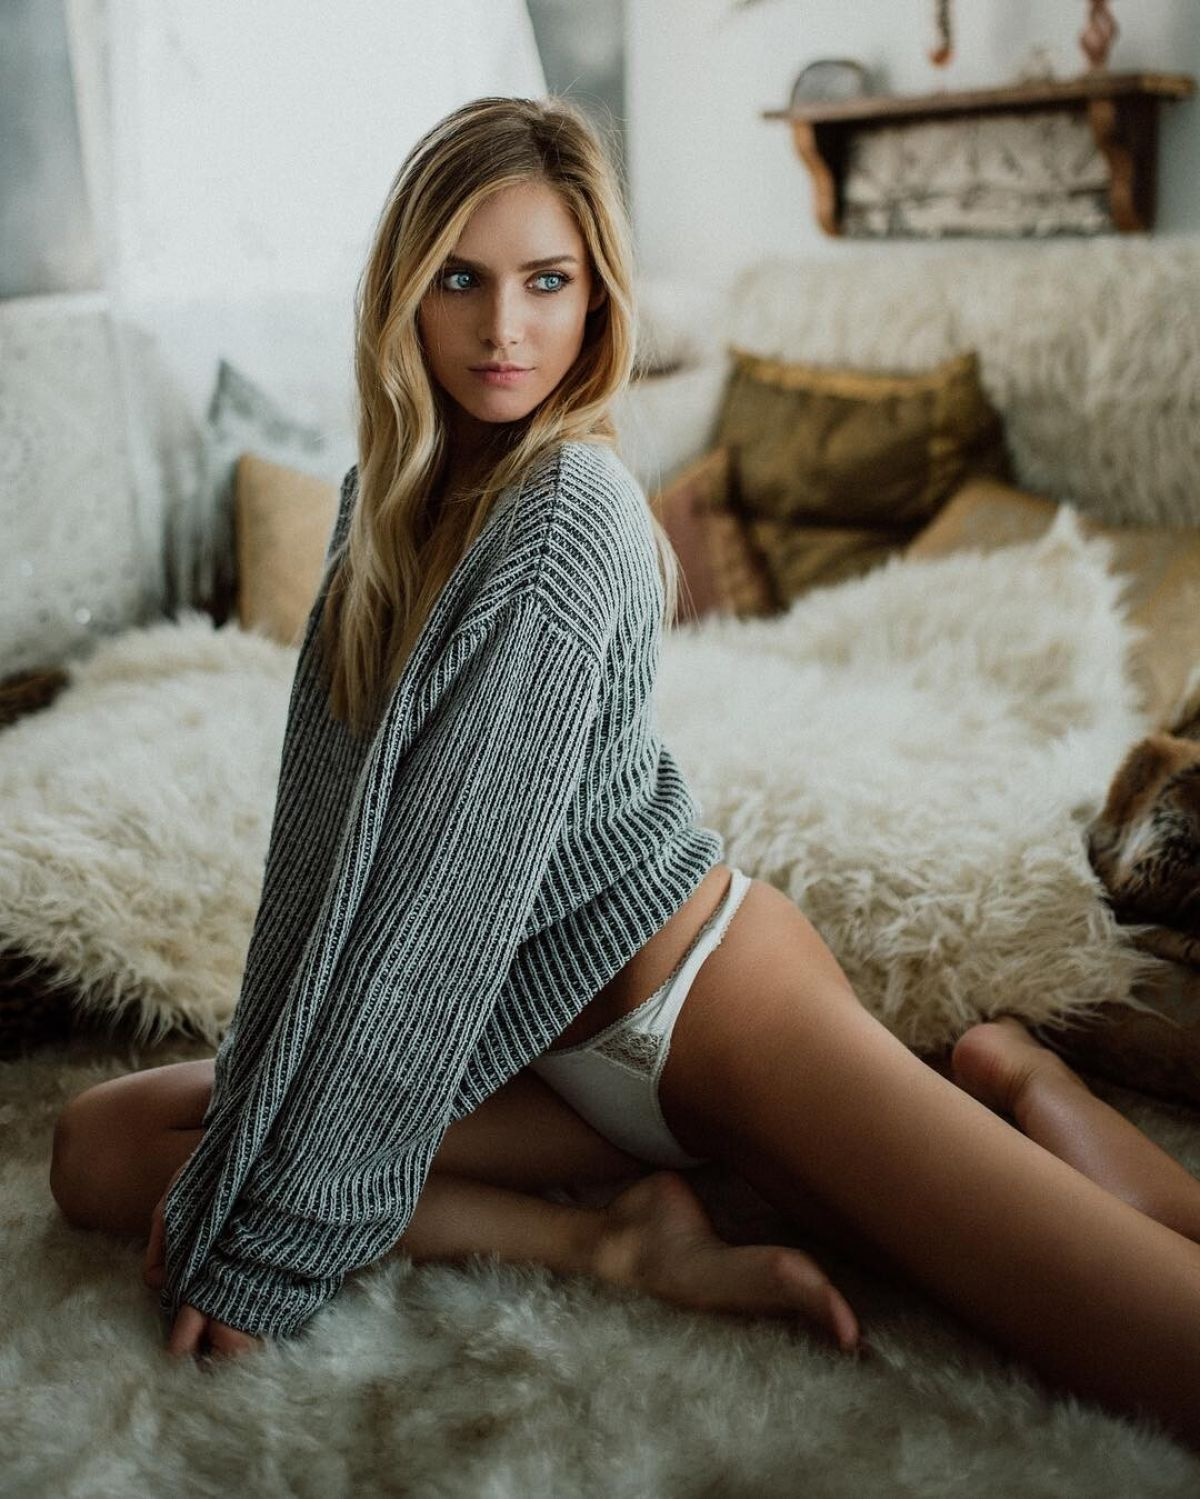 Riley Steele